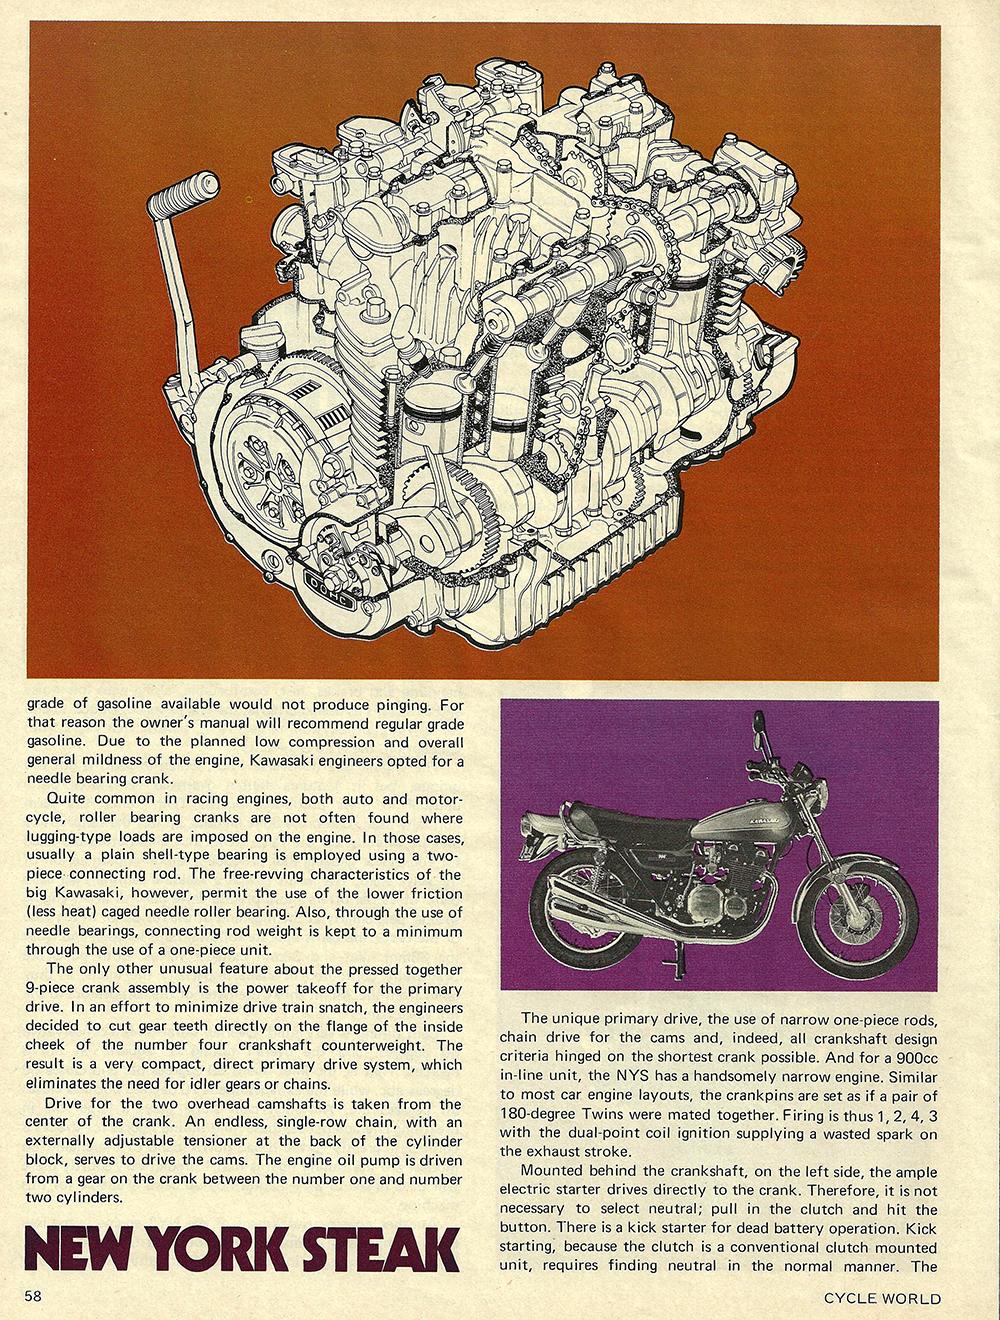 1972 Kawasaki Z1 900 New York Steak road test 03.jpg